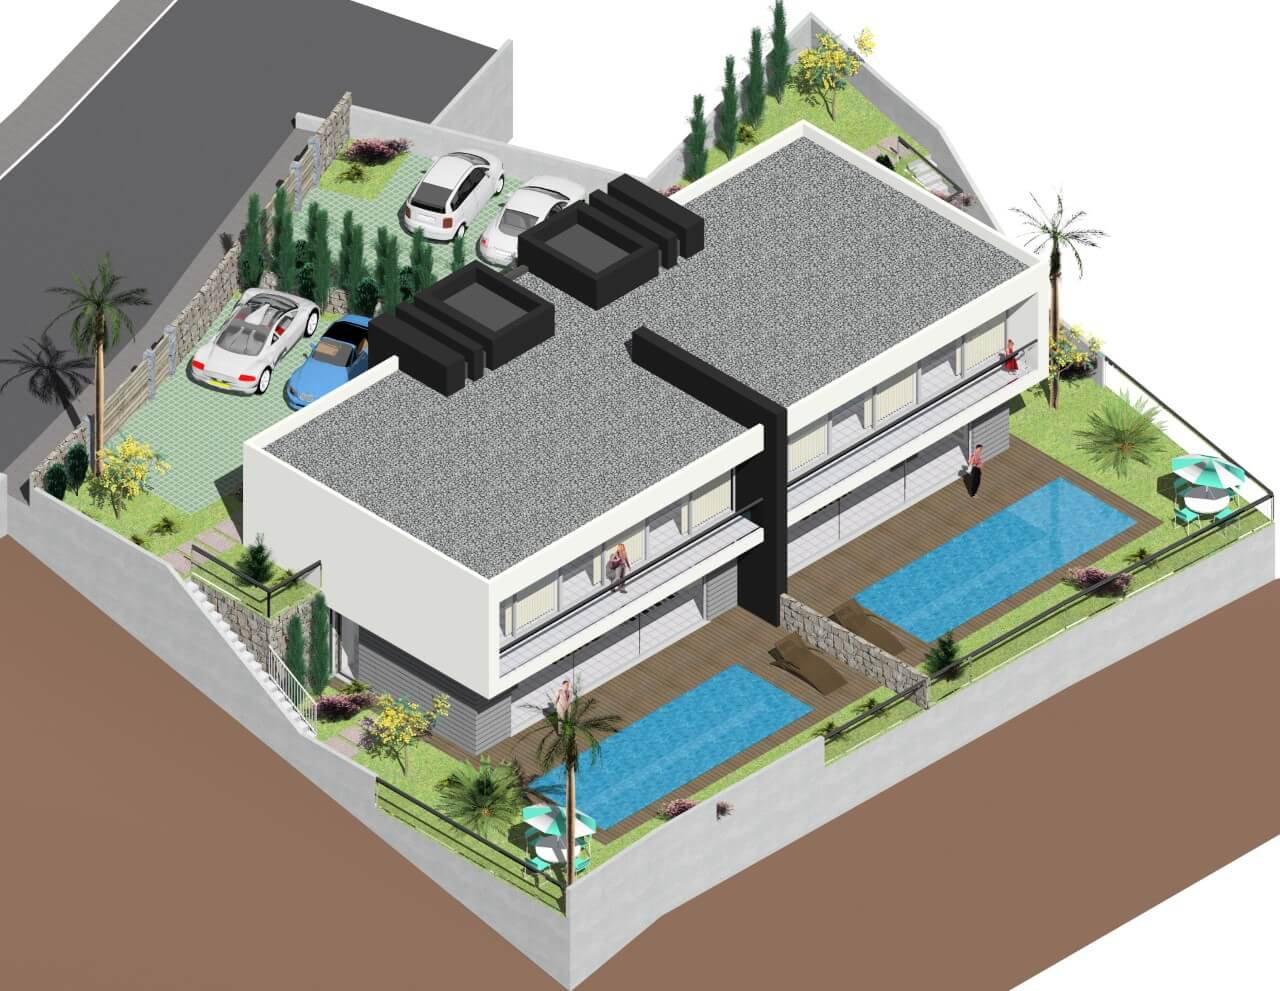 Casa Moderna T3 Nova Semi-Geminada de 170 m2 com 310 m2 de Terreno, Piscina e Vista Mar. Calheta